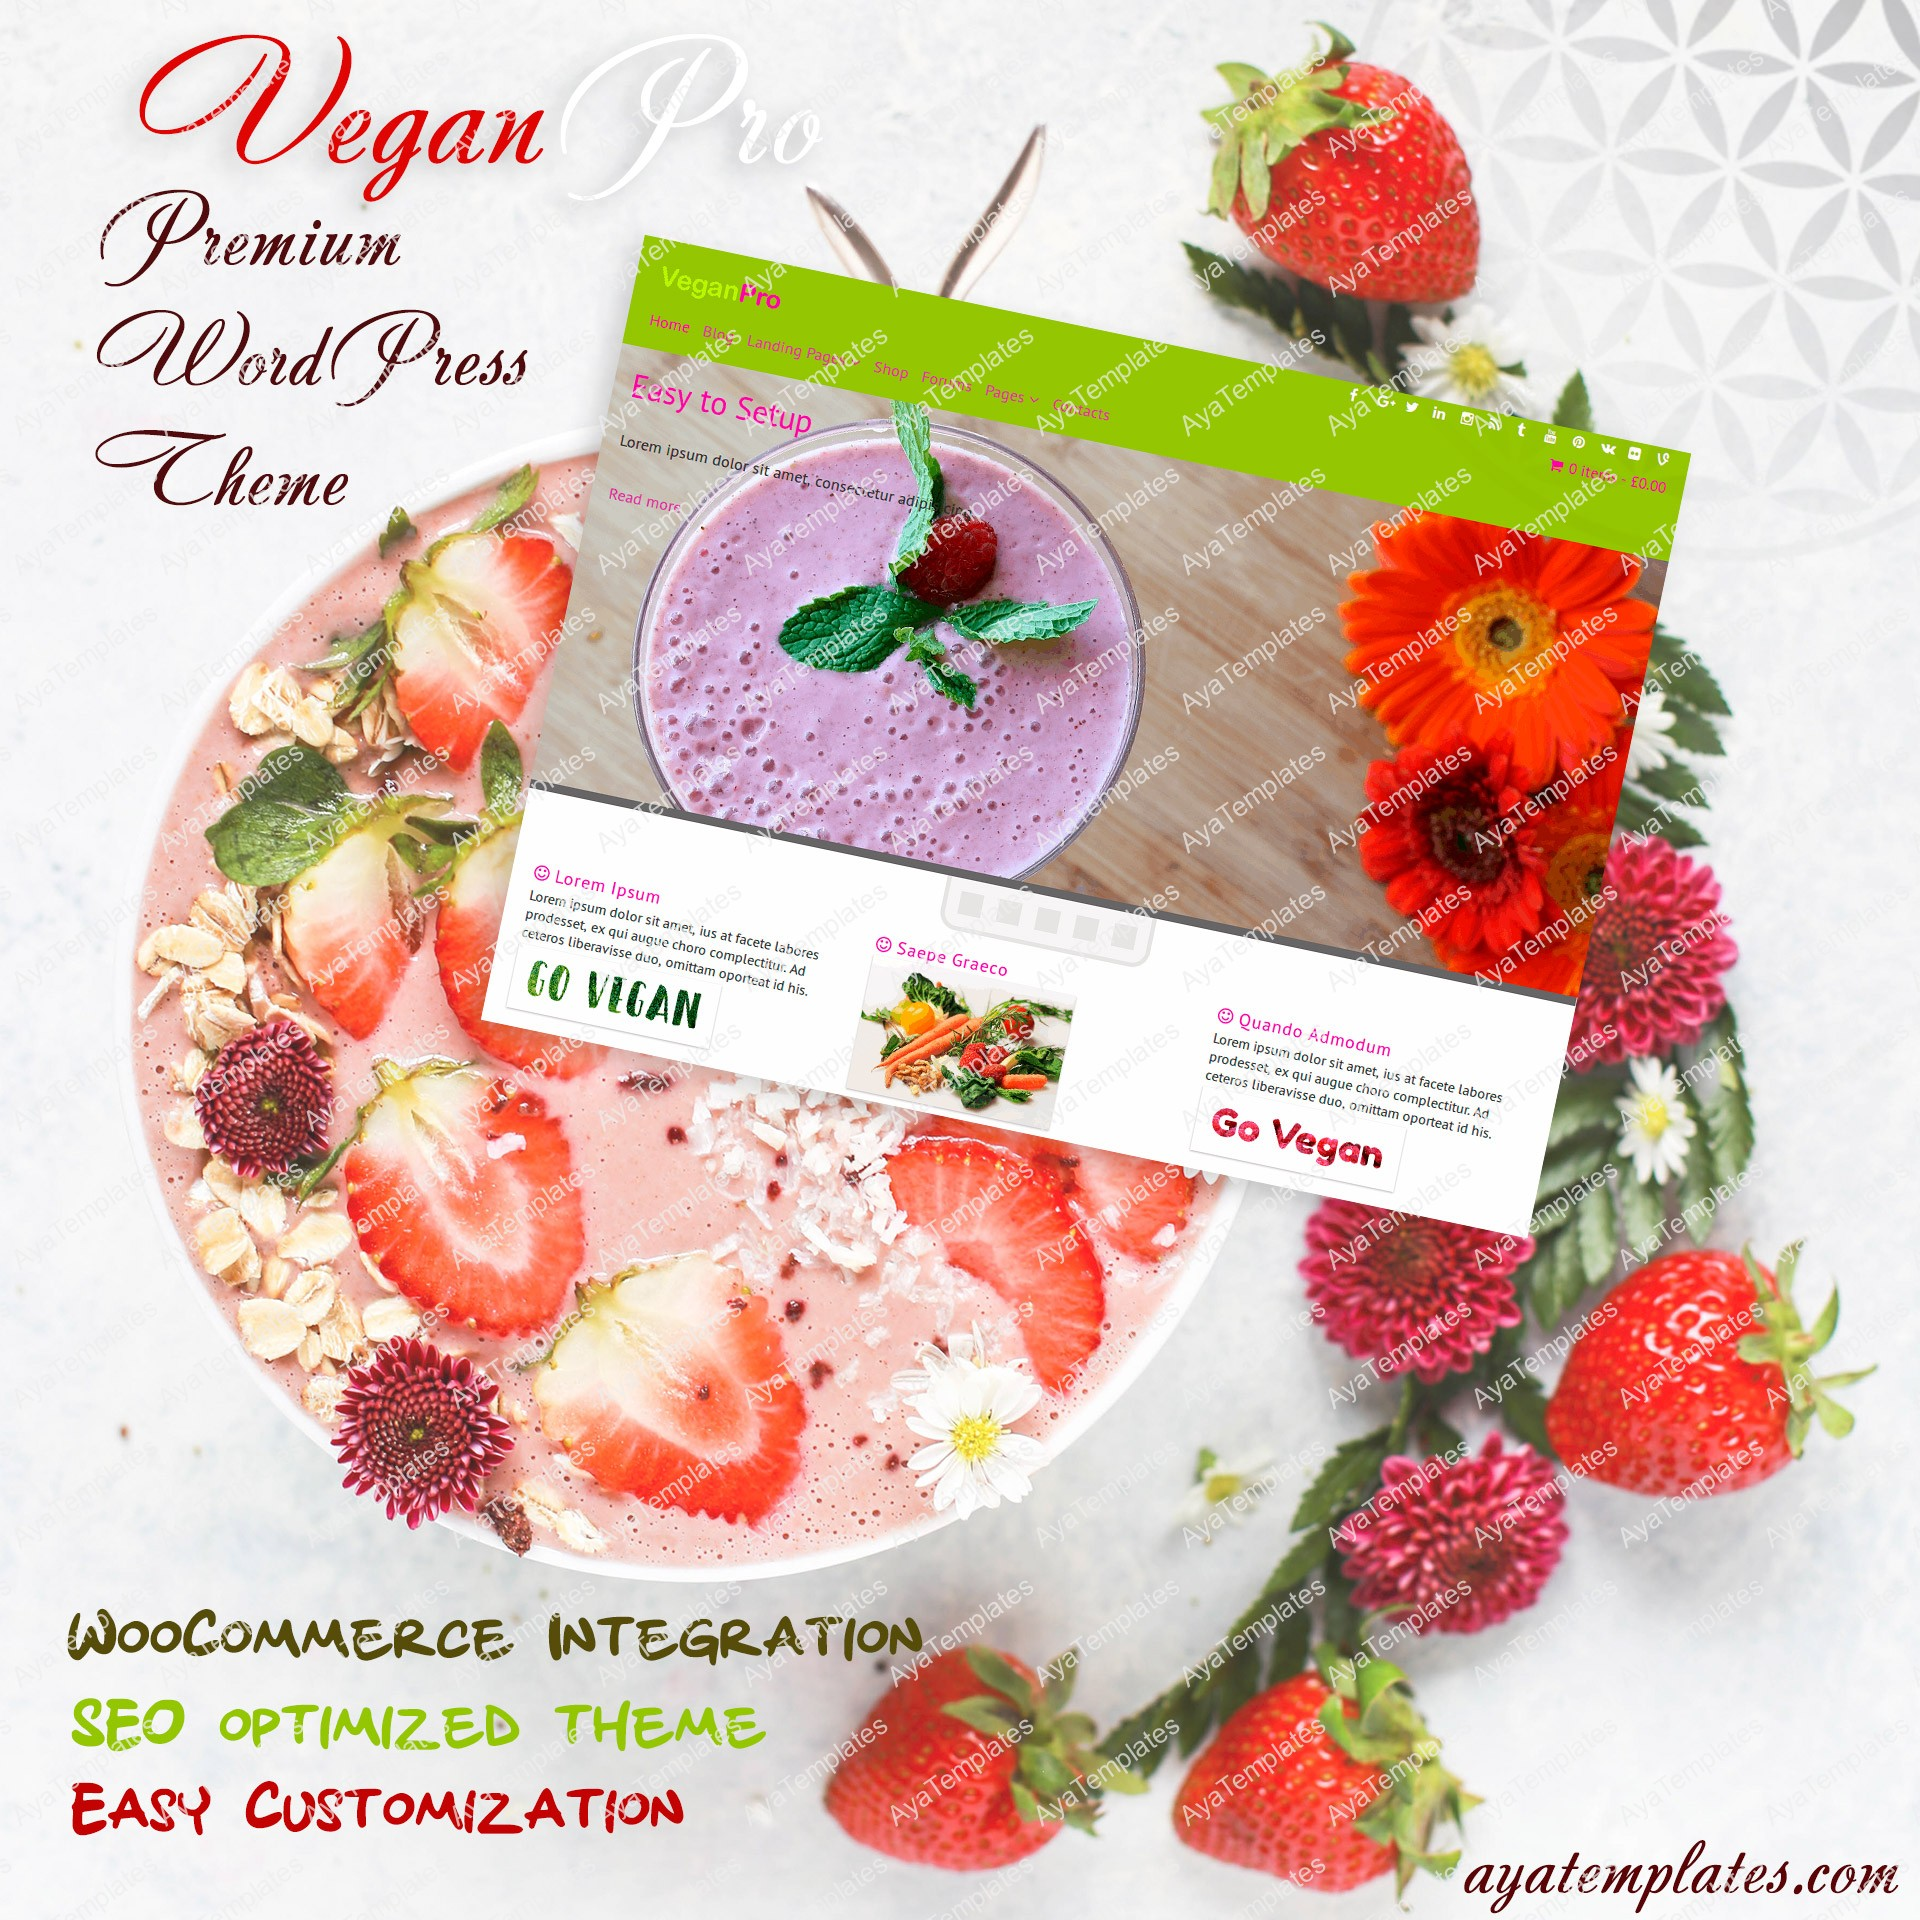 veganpro-premium-wordpress-theme-mockup-ayatemplates-com